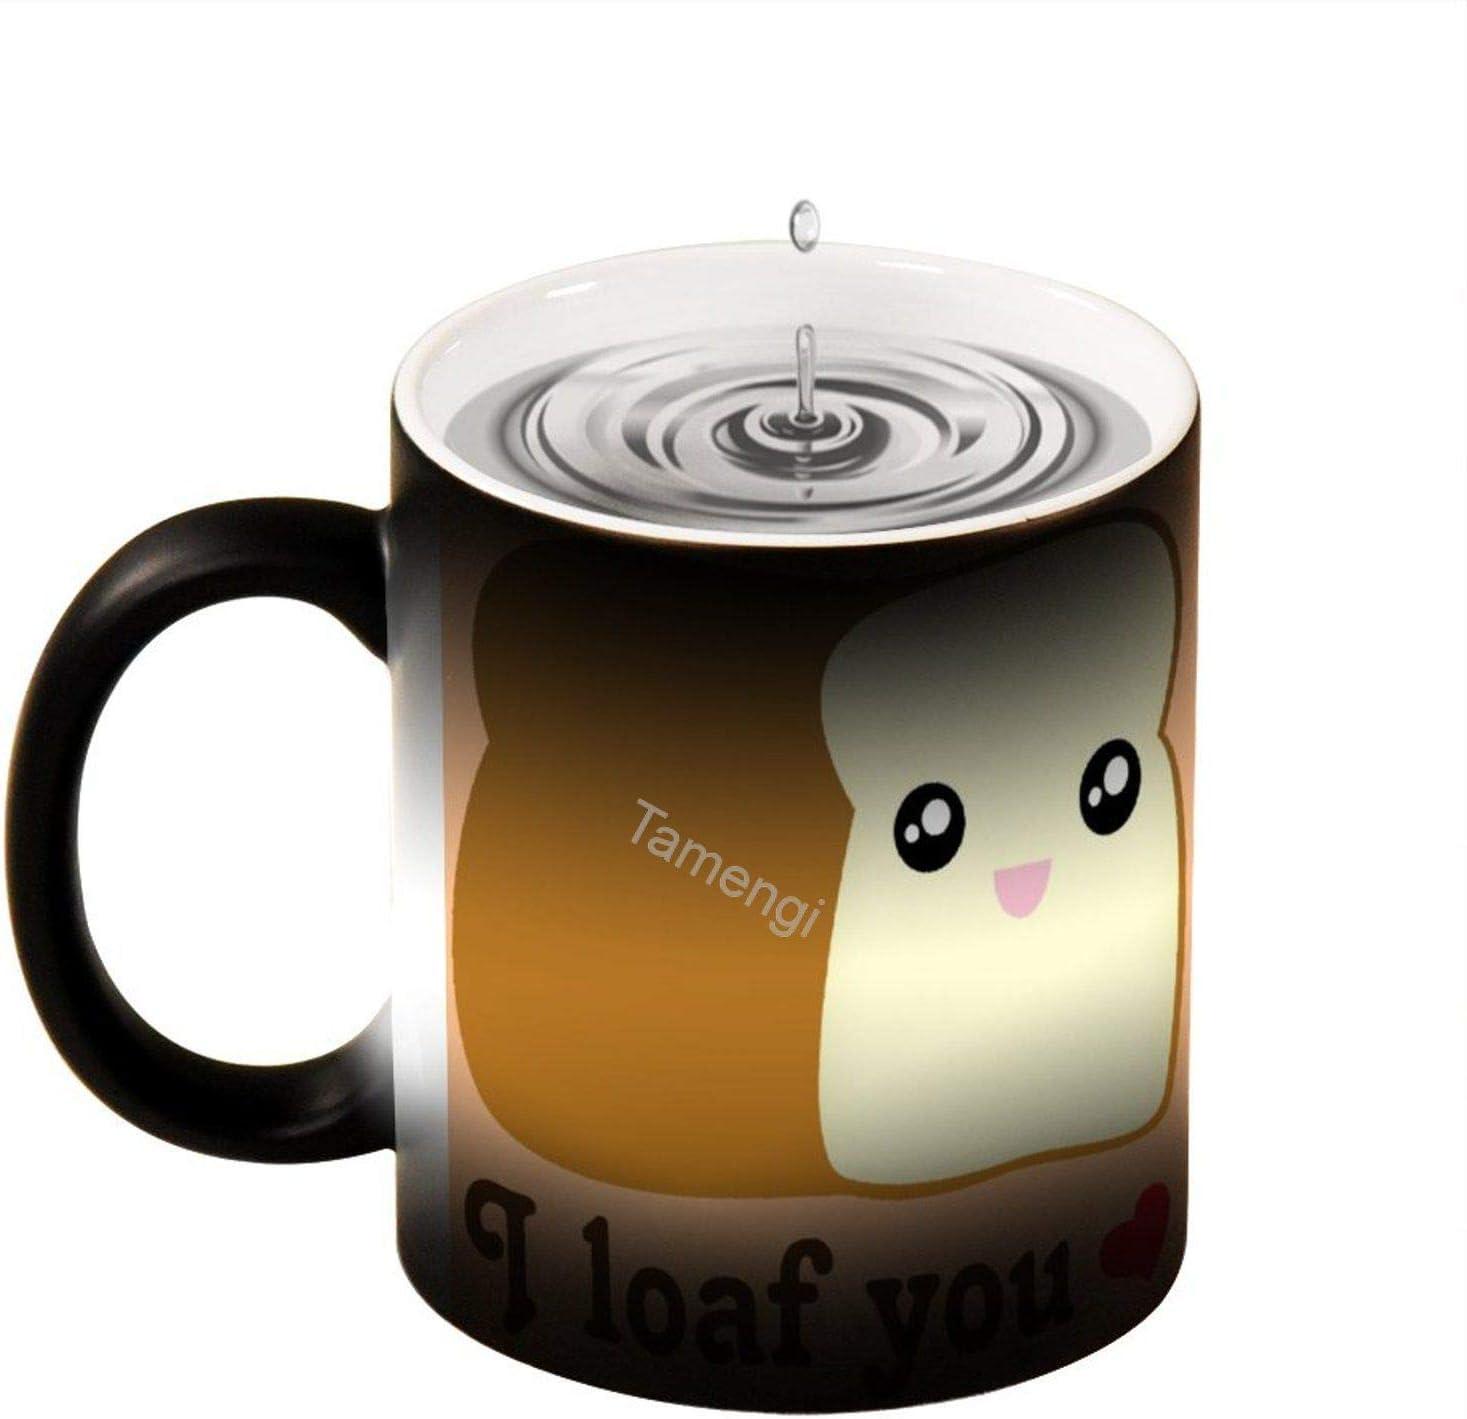 I loaf you kawaii bread funny food pun Heat Changing Ceramic Coffee Mug, 11 oz Heat Sensitive Color Changing Coffee Mug Cup